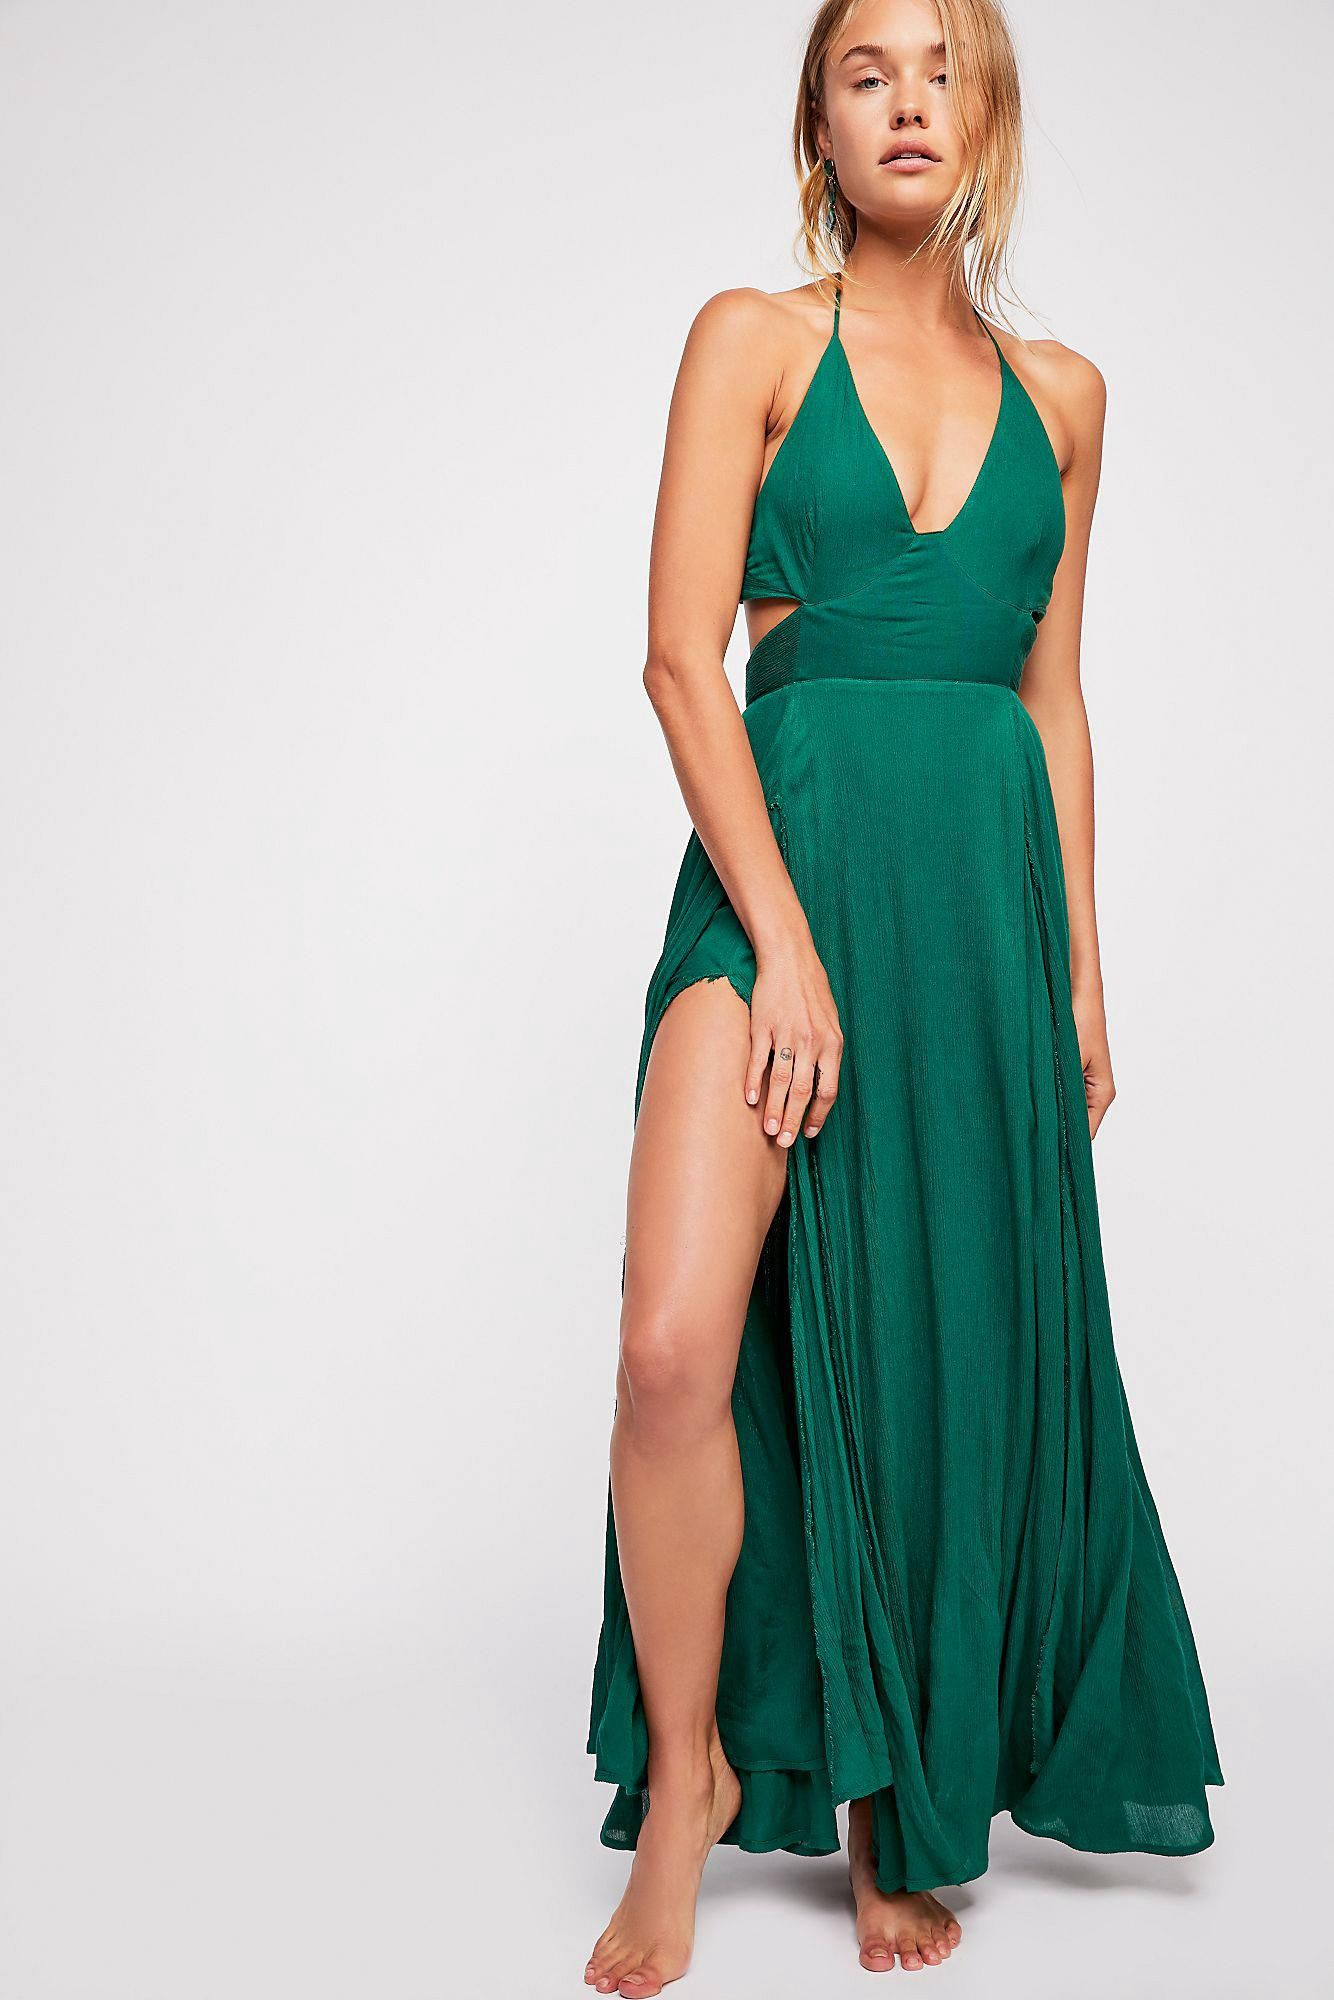 Free People Lille Maxi Dress Summer Bronze Xs Maxidressessummer Maxi Dress Summer Dresses Maxi Dress Green [ 2000 x 1334 Pixel ]